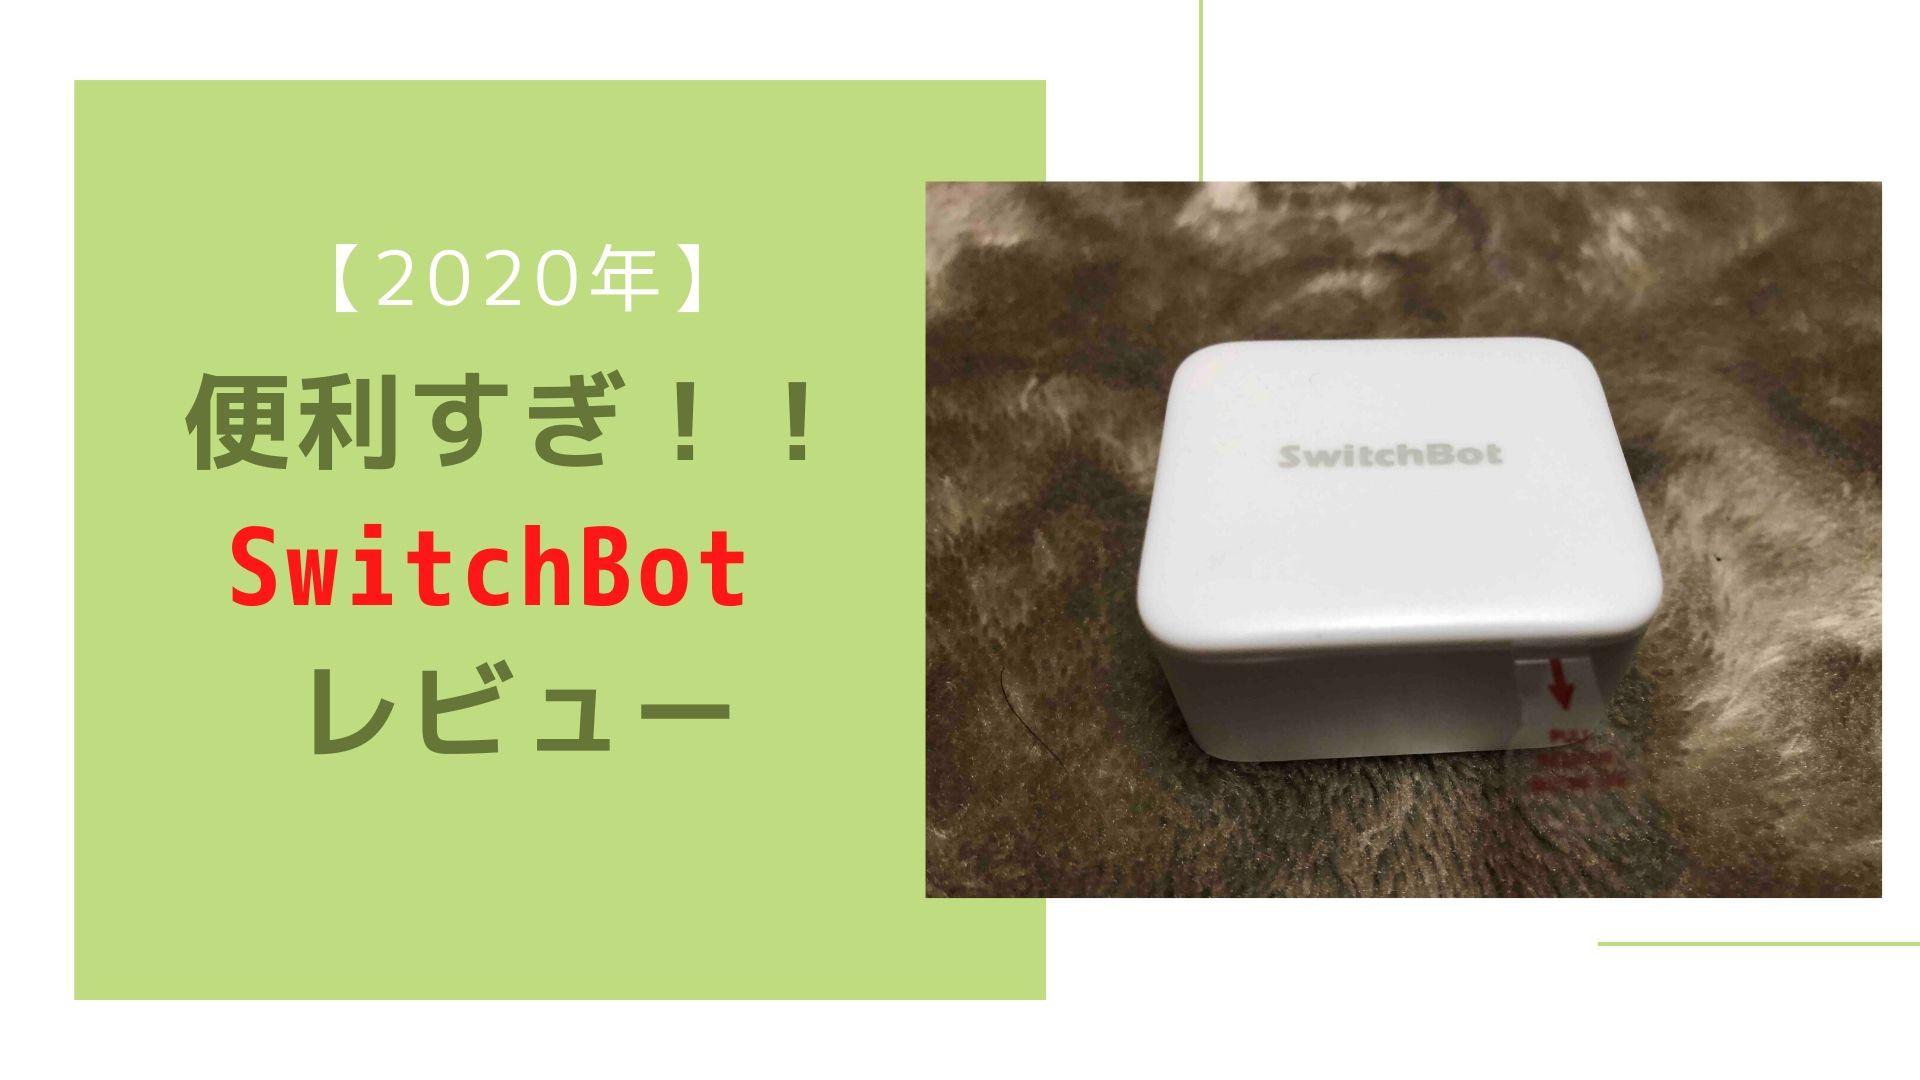 Switchbotレビュー